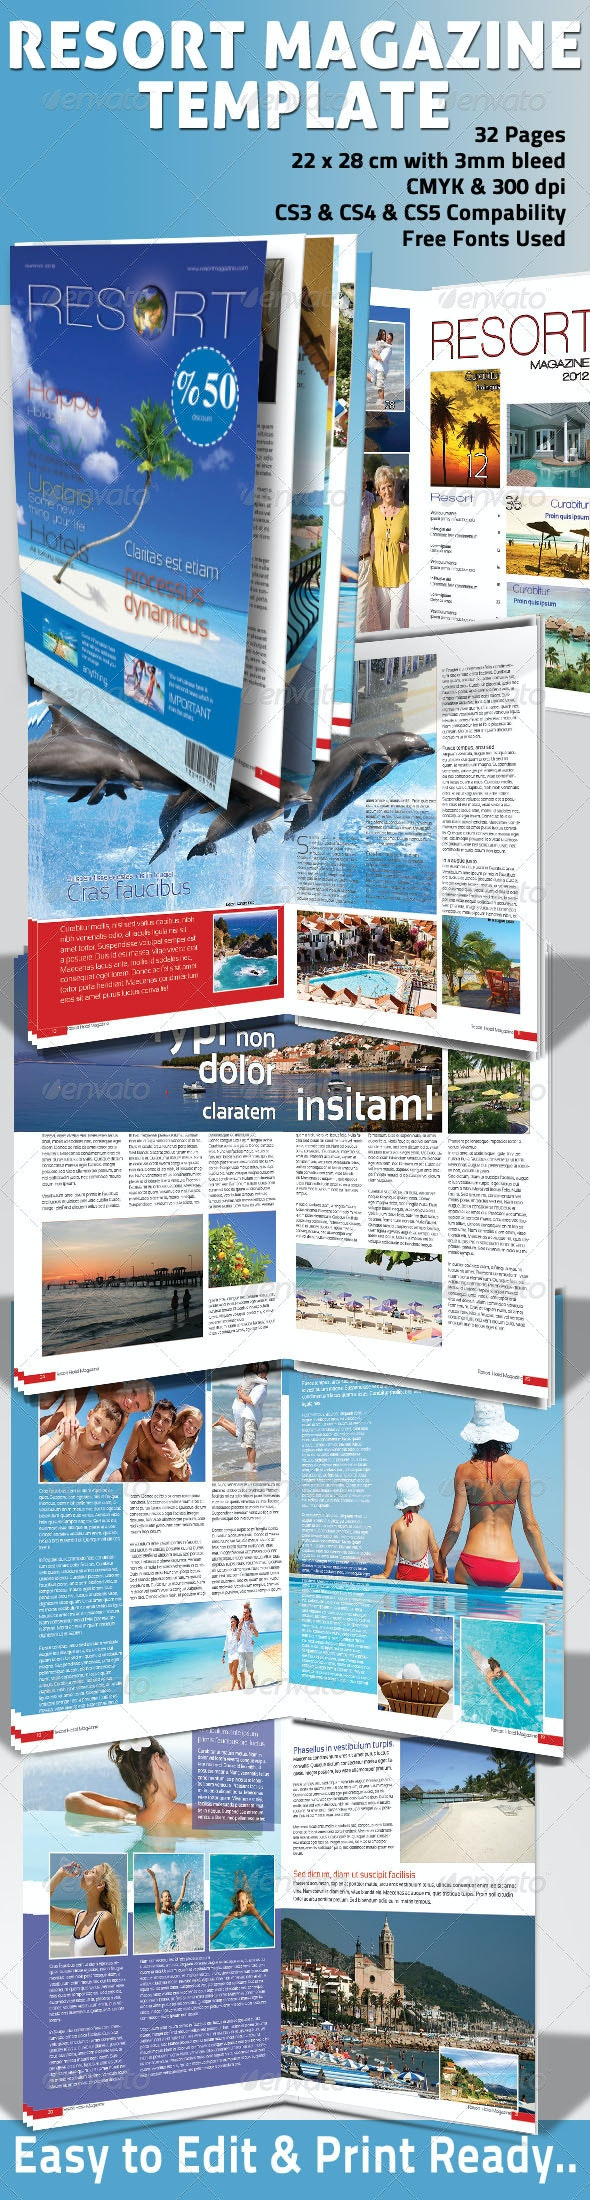 Resort Magazine Template - Magazines Print Templates